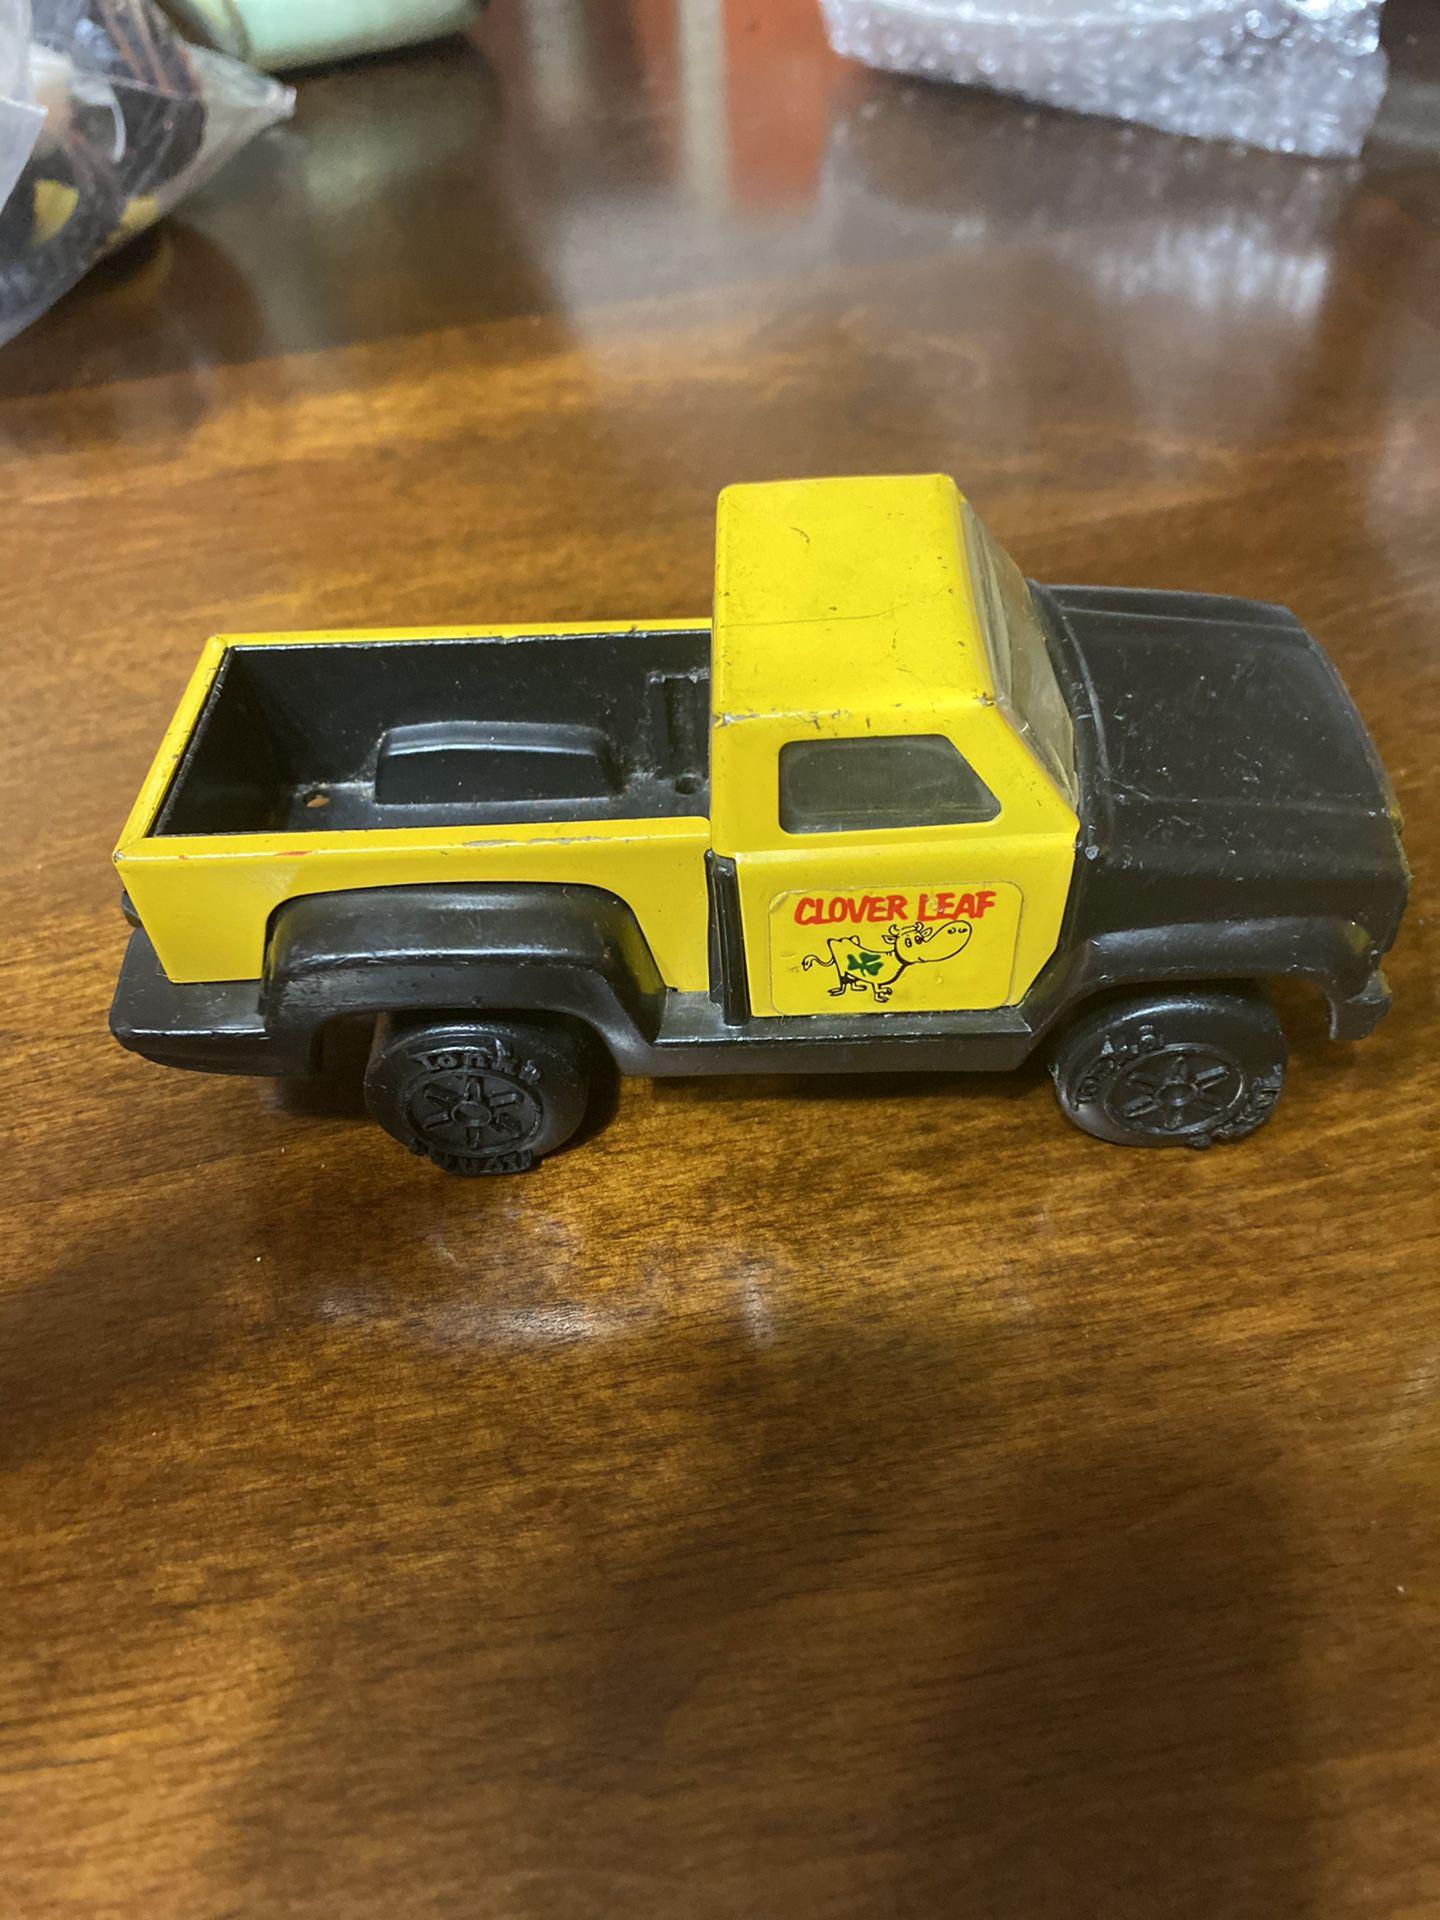 1979 Tonka Farm Truck, Tractor and Trailer